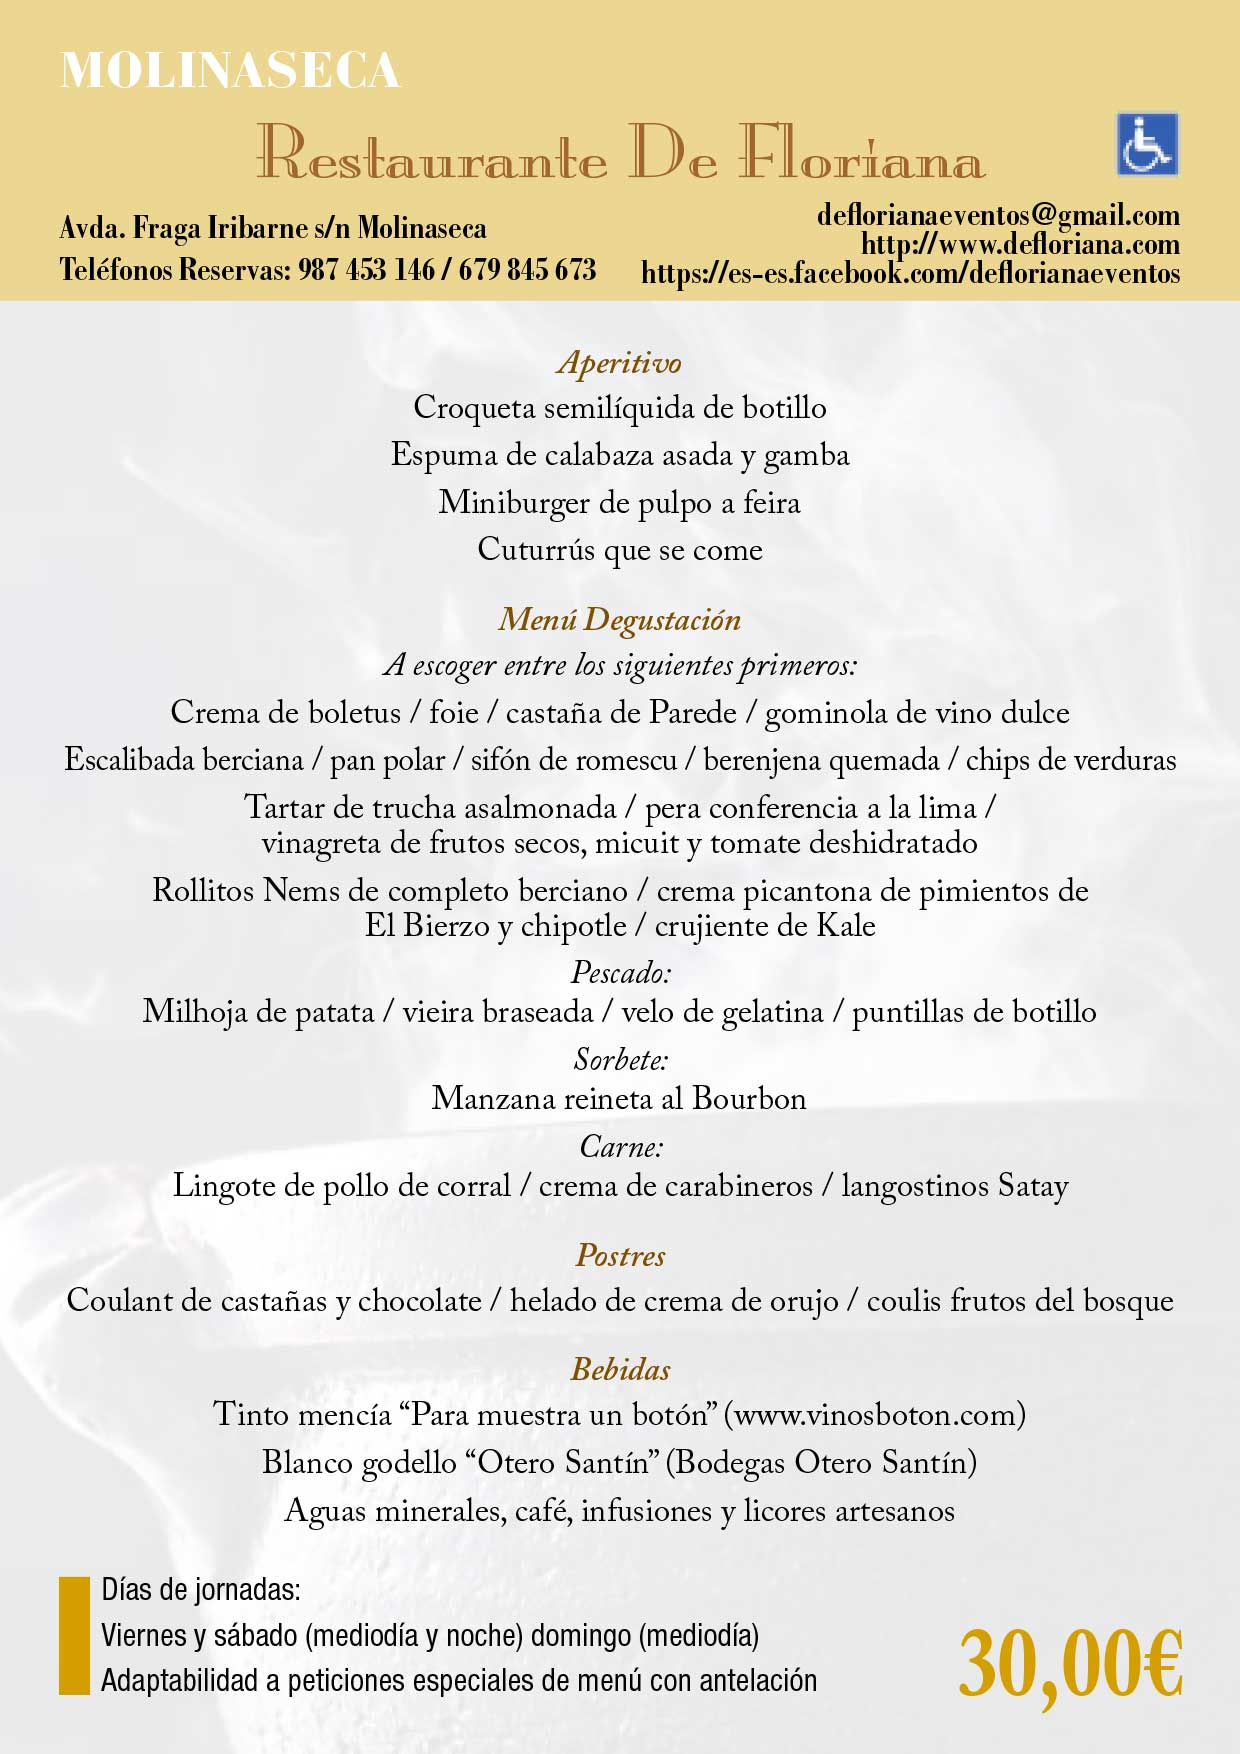 XXXIII Jornadas gastronómicas del Bierzo 2017. Restaurantes participantes 46